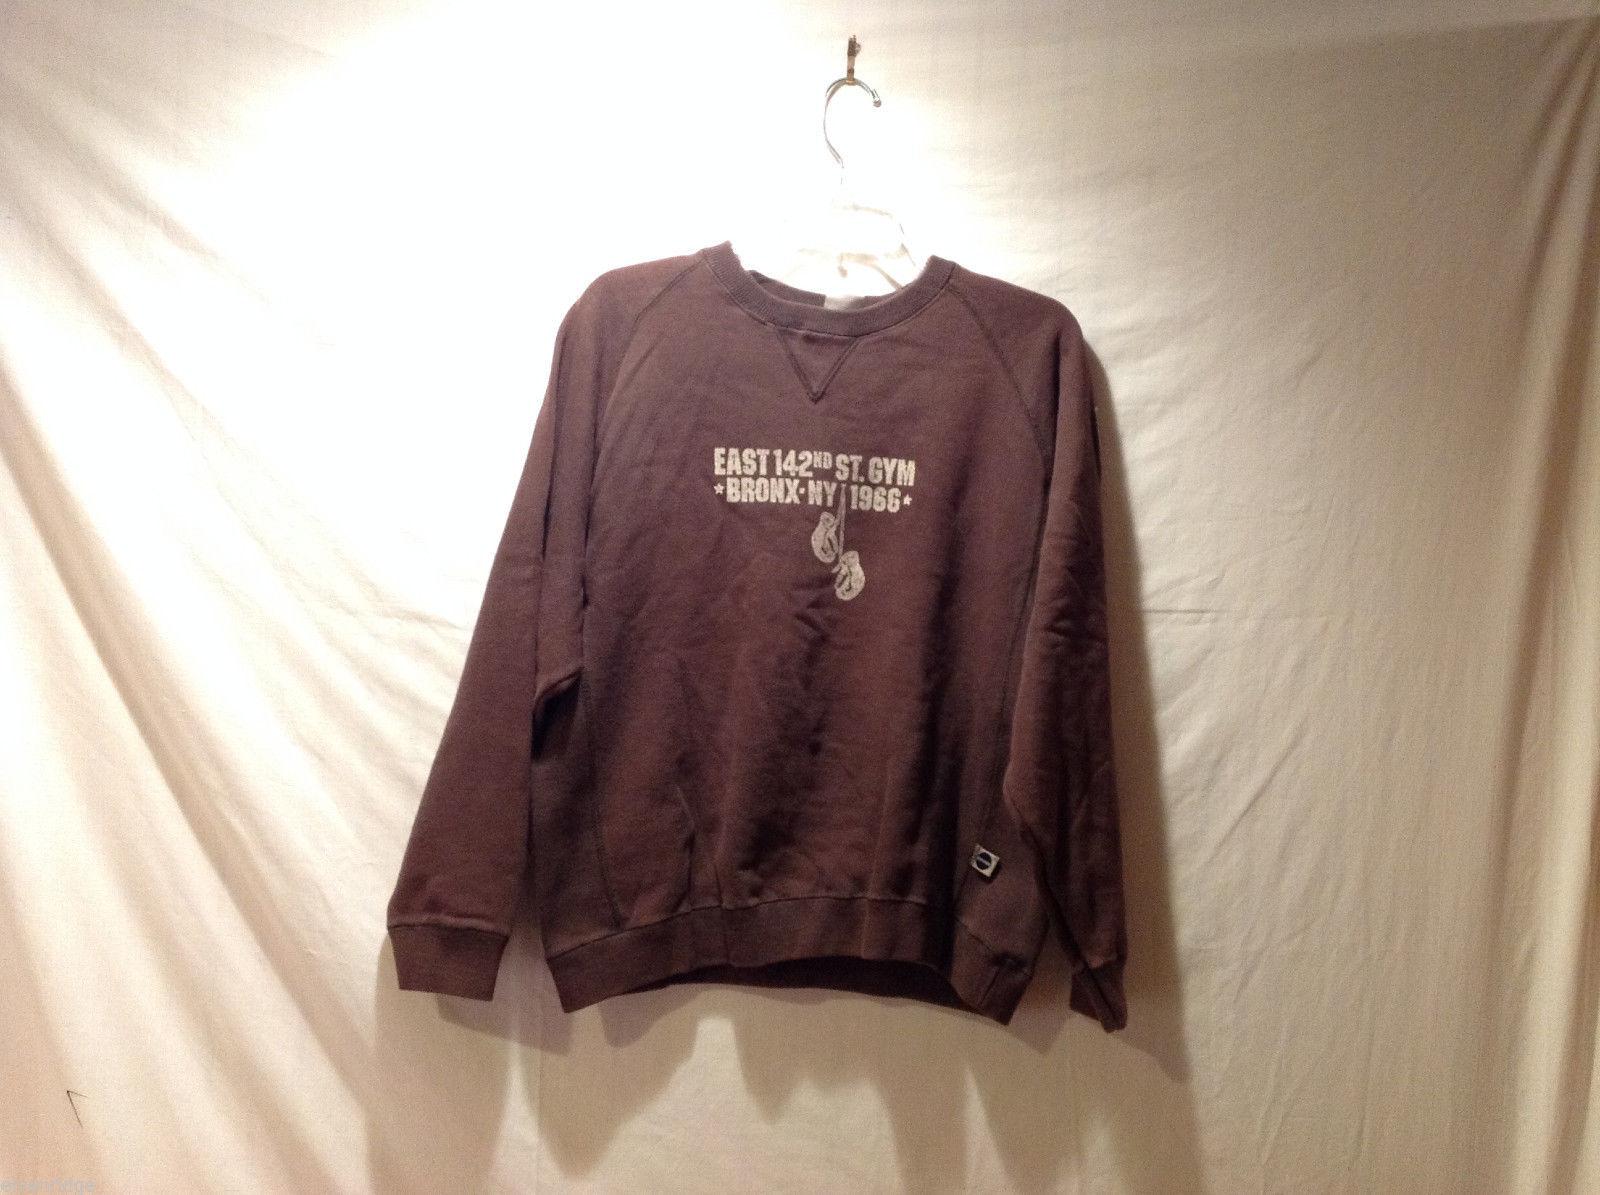 Blue Marlin Kids Brown Sweatshirt Est.142nd St. Gym Bronx NY 1966, Size L(14-16)